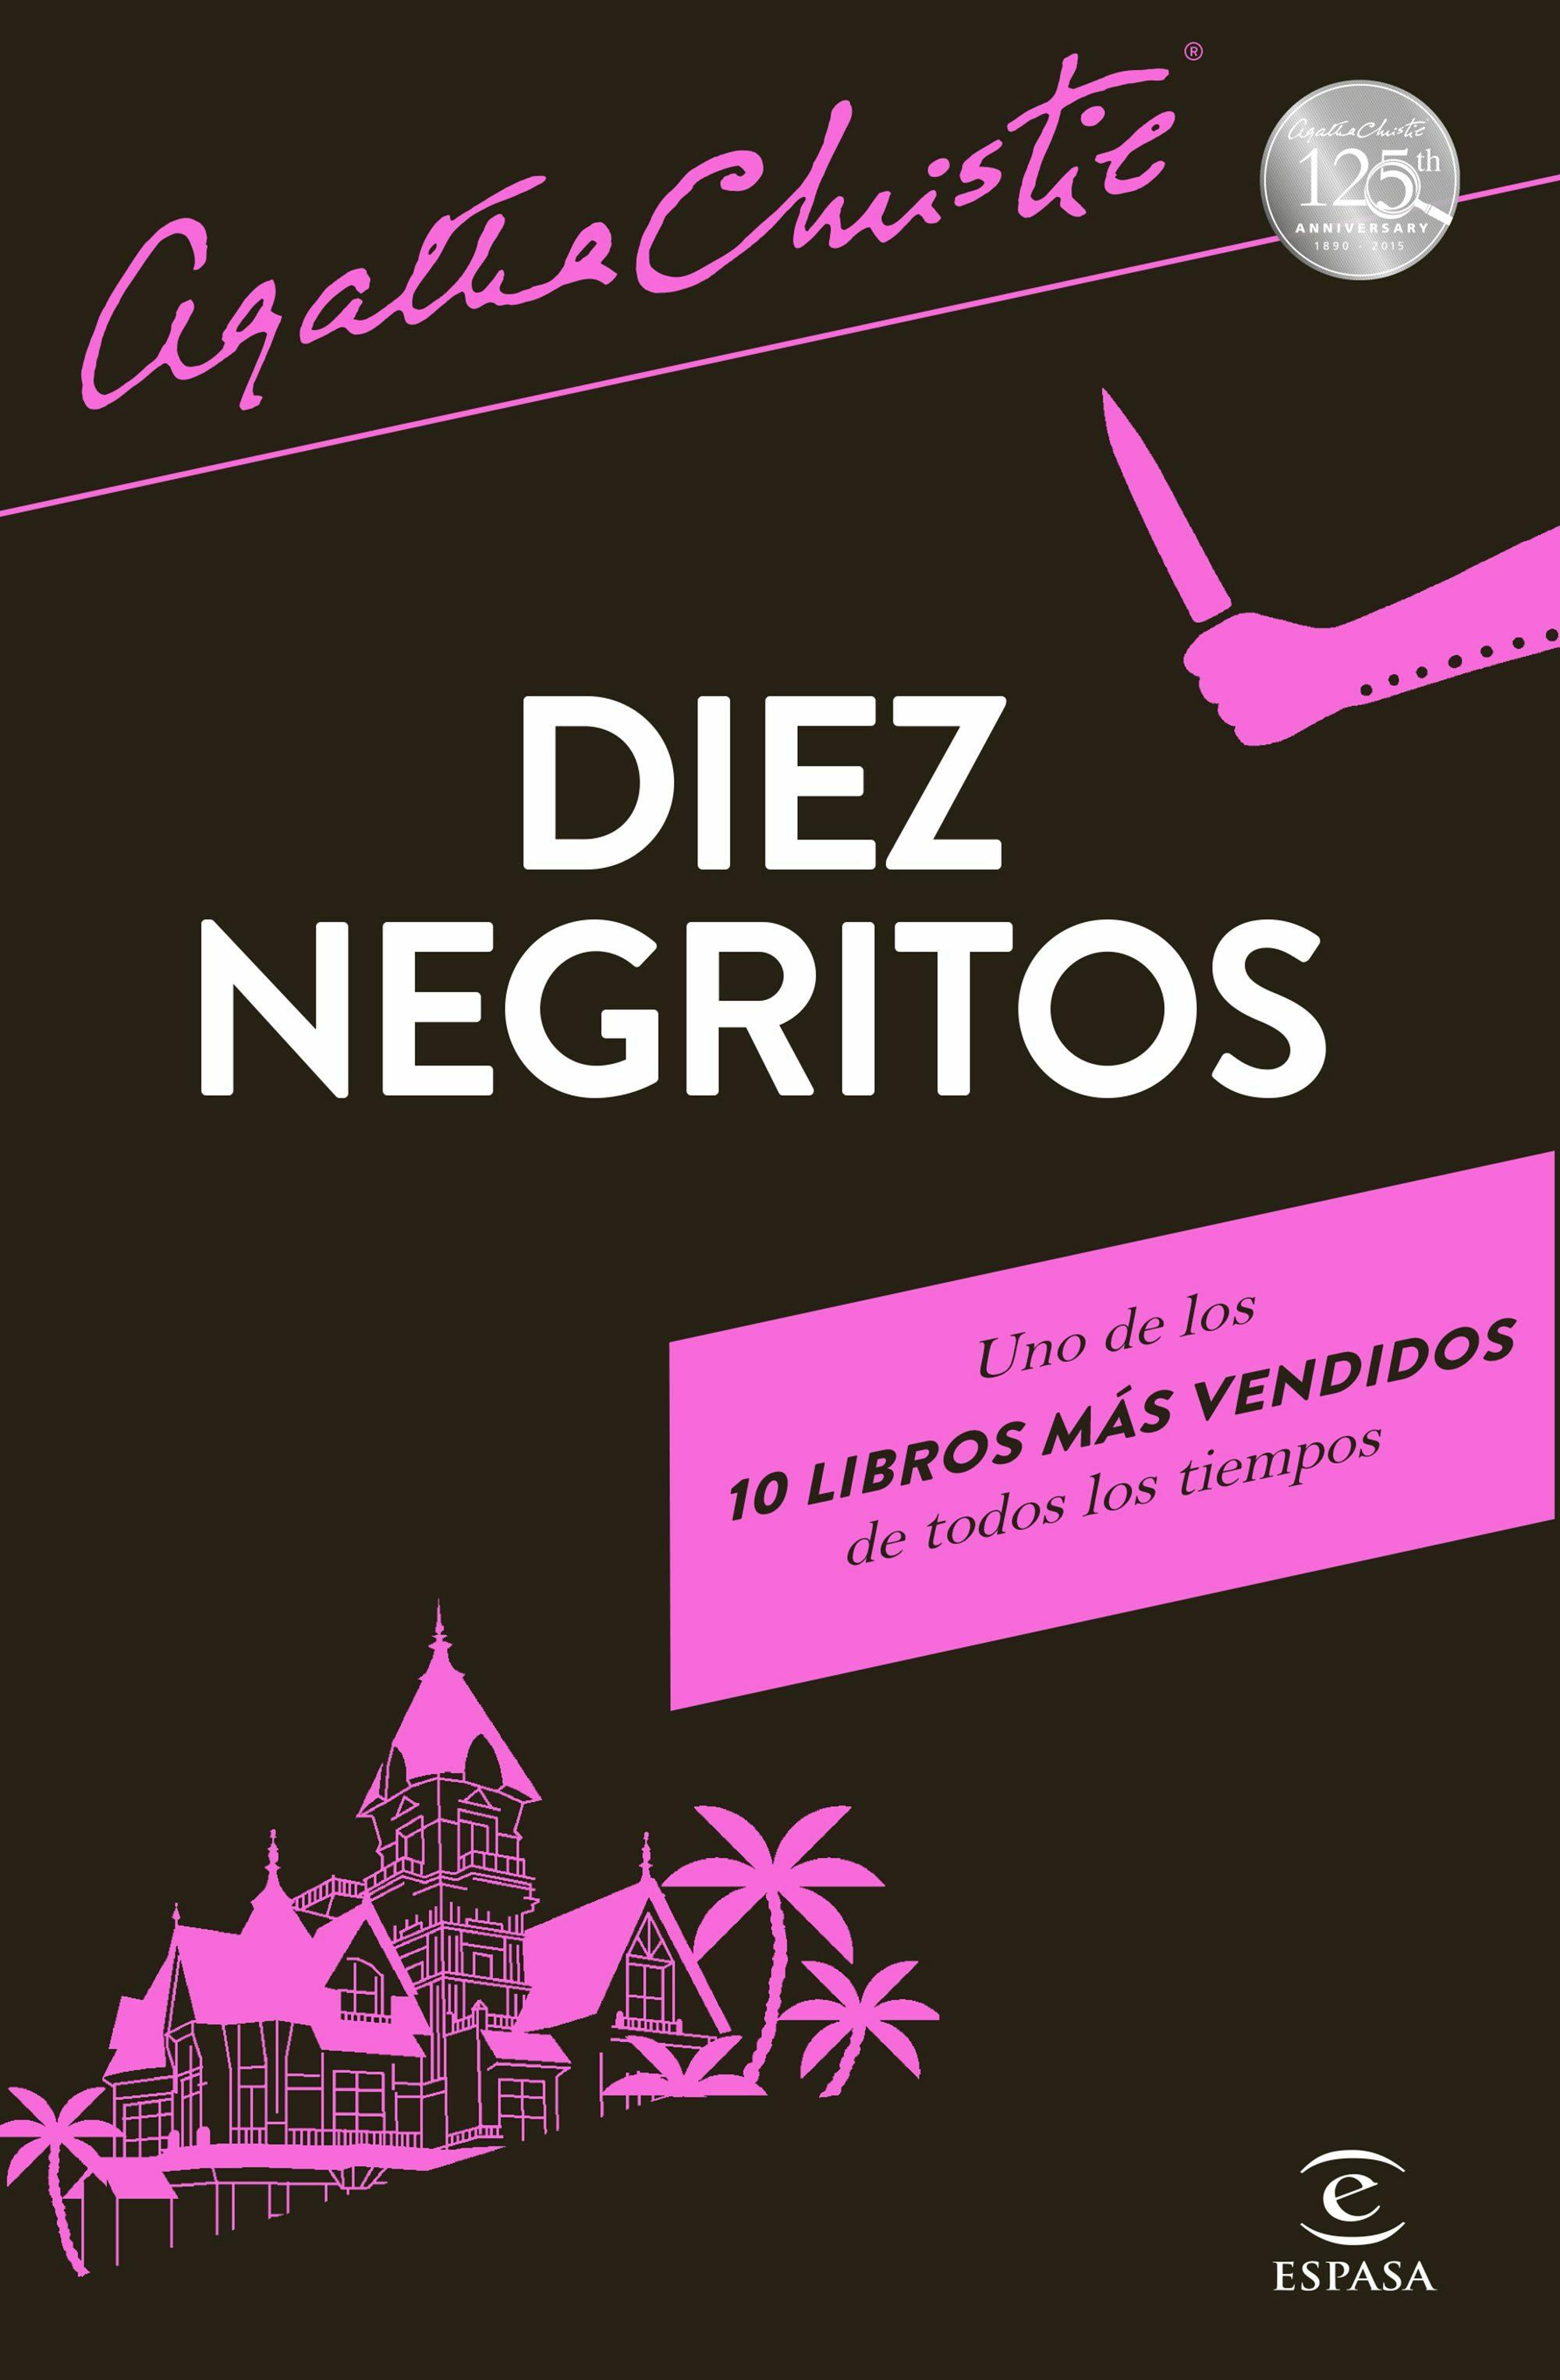 https://tintaliteratura.blogspot.com.es/2018/05/diez-negritos-agatha-christie.html